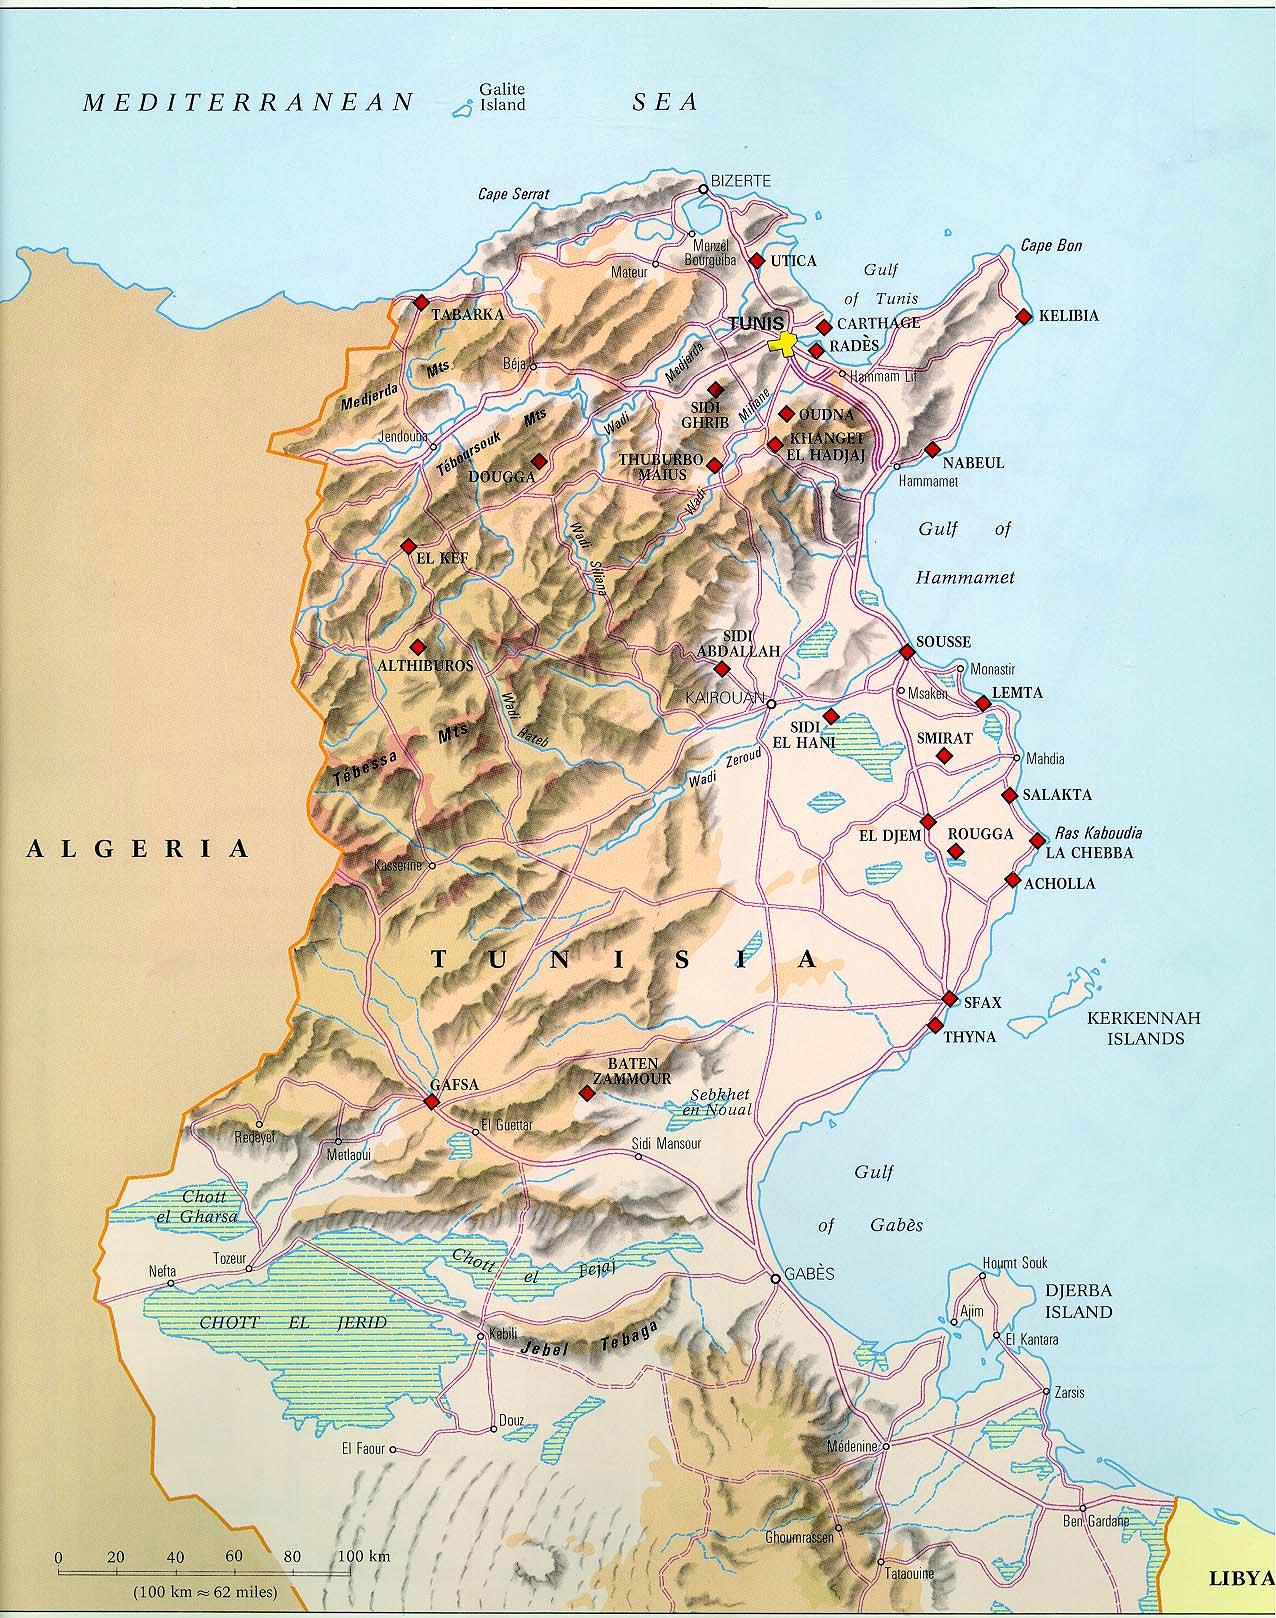 karte tunesien Karten von Tunesien | Karten von Tunesien zum Herunterladen und  karte tunesien